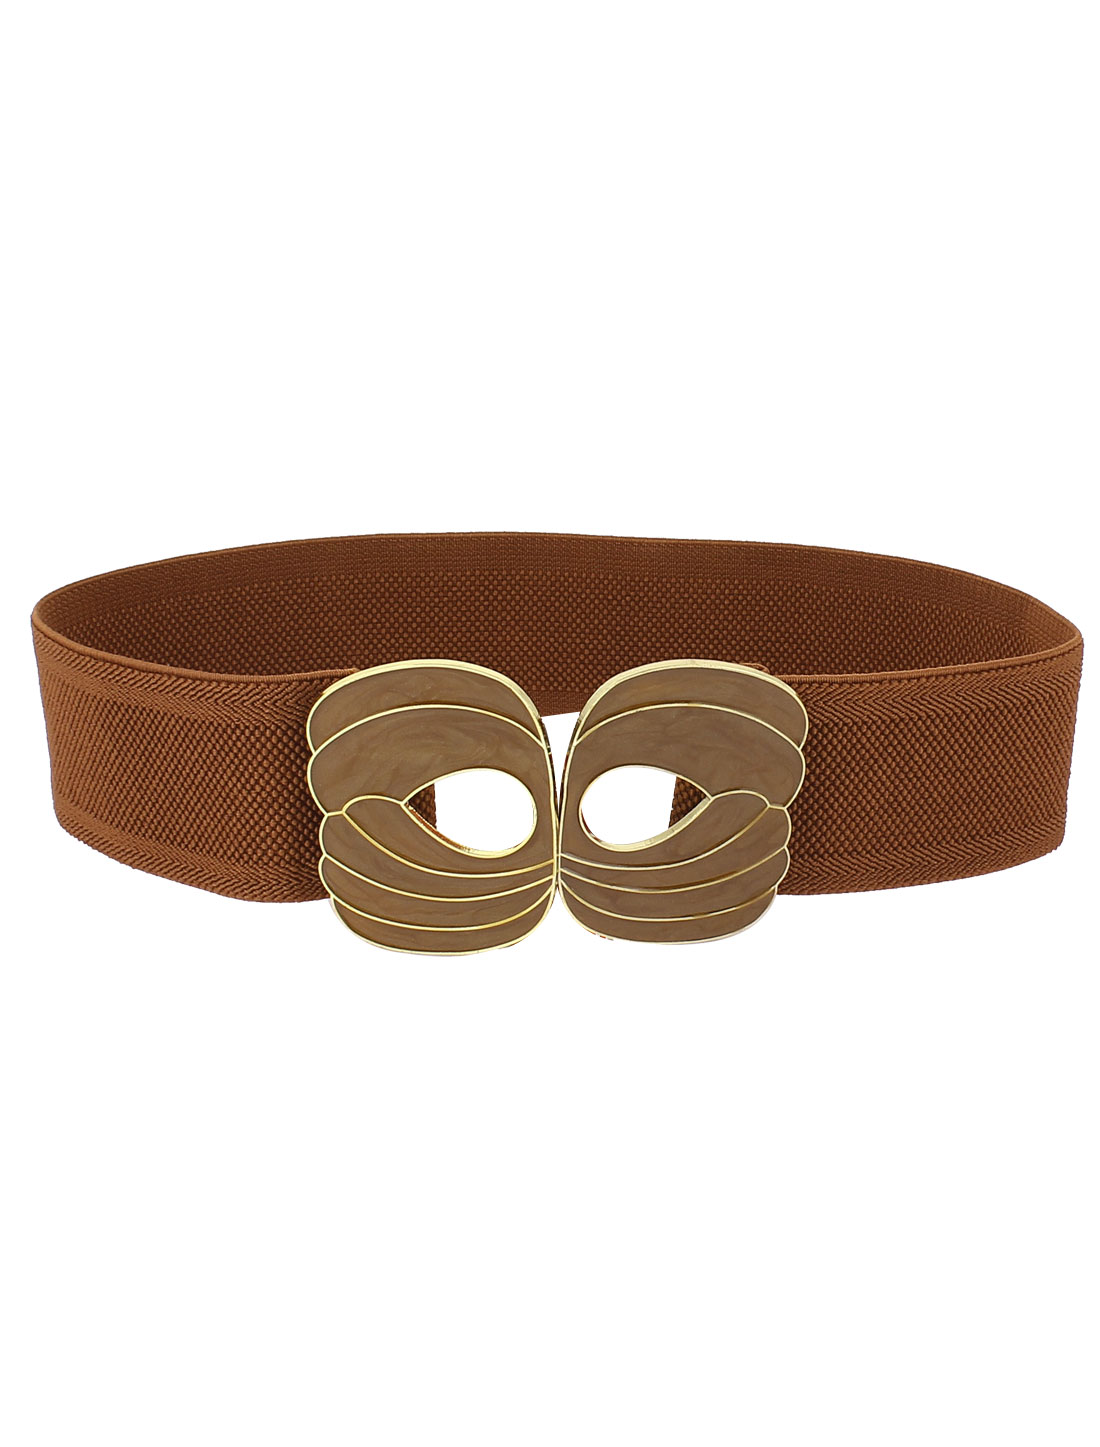 Lady Metal Flower Interlocking Buckle Elastic Waist Belt Waistband Brown